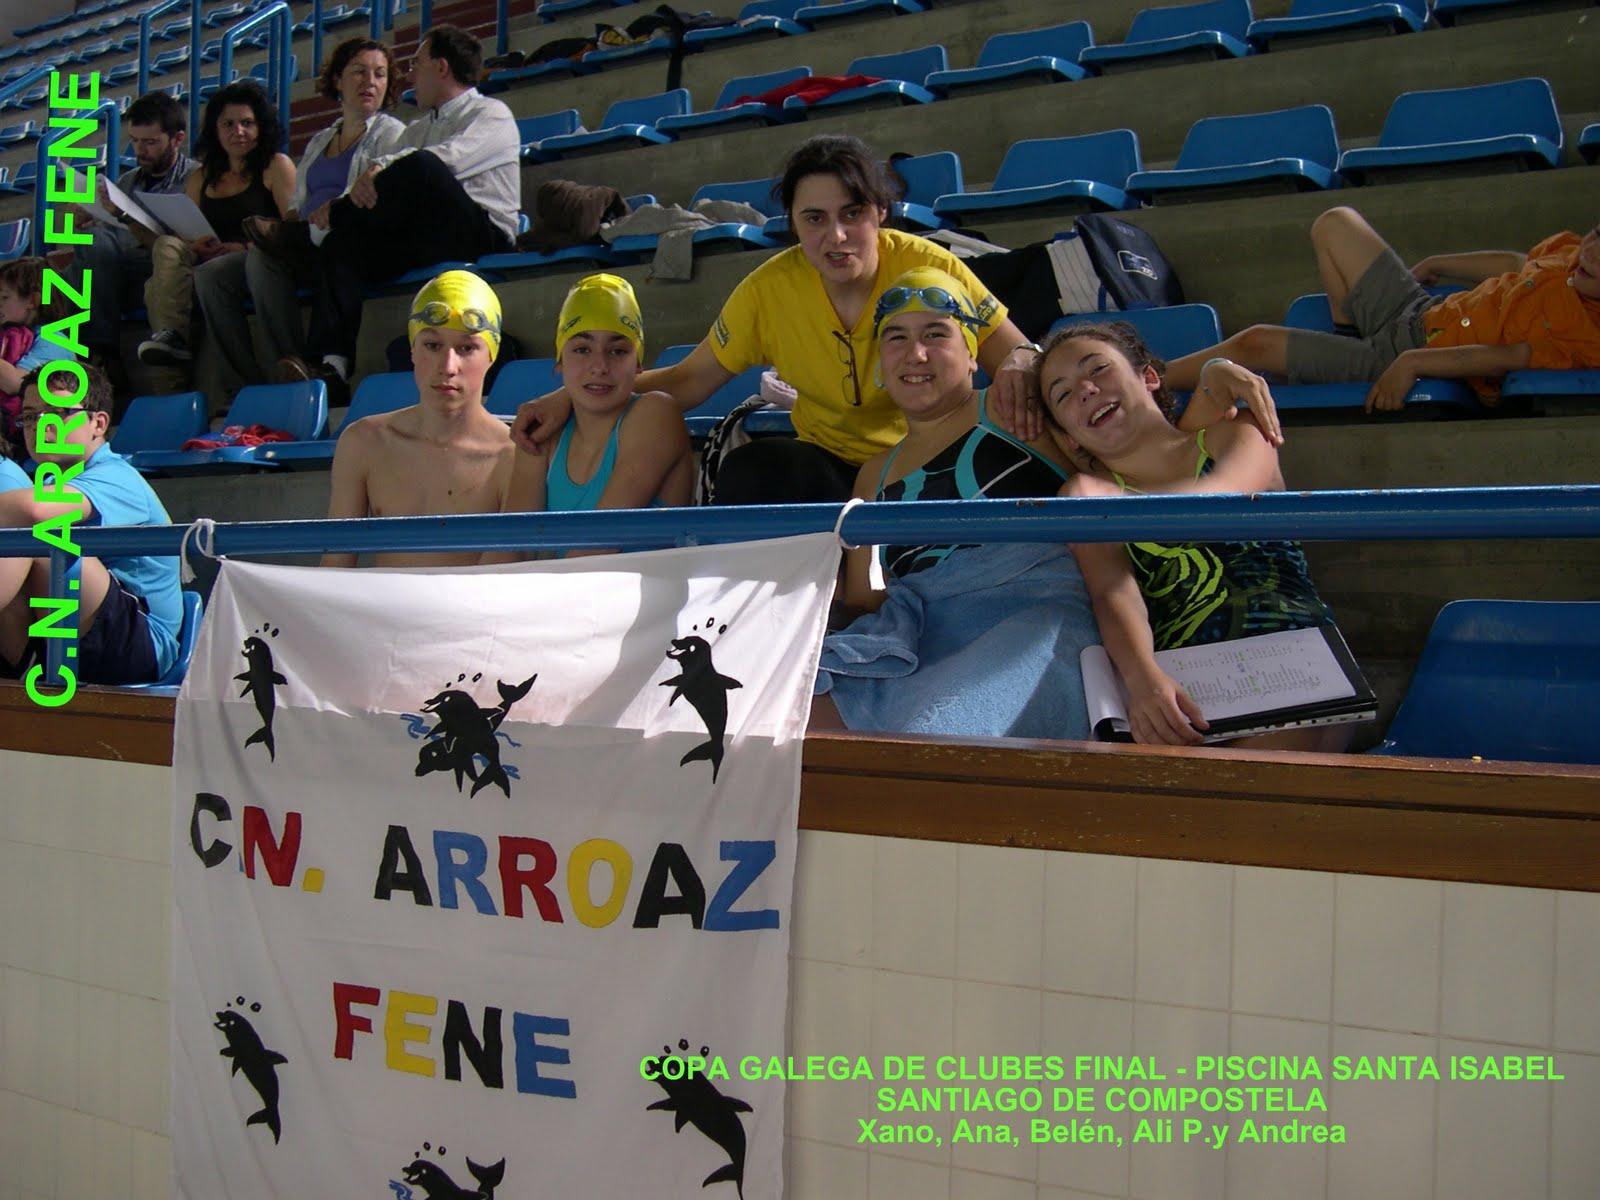 Club nataci n arroaz fene mayo 2011 - Piscina santiago de compostela ...